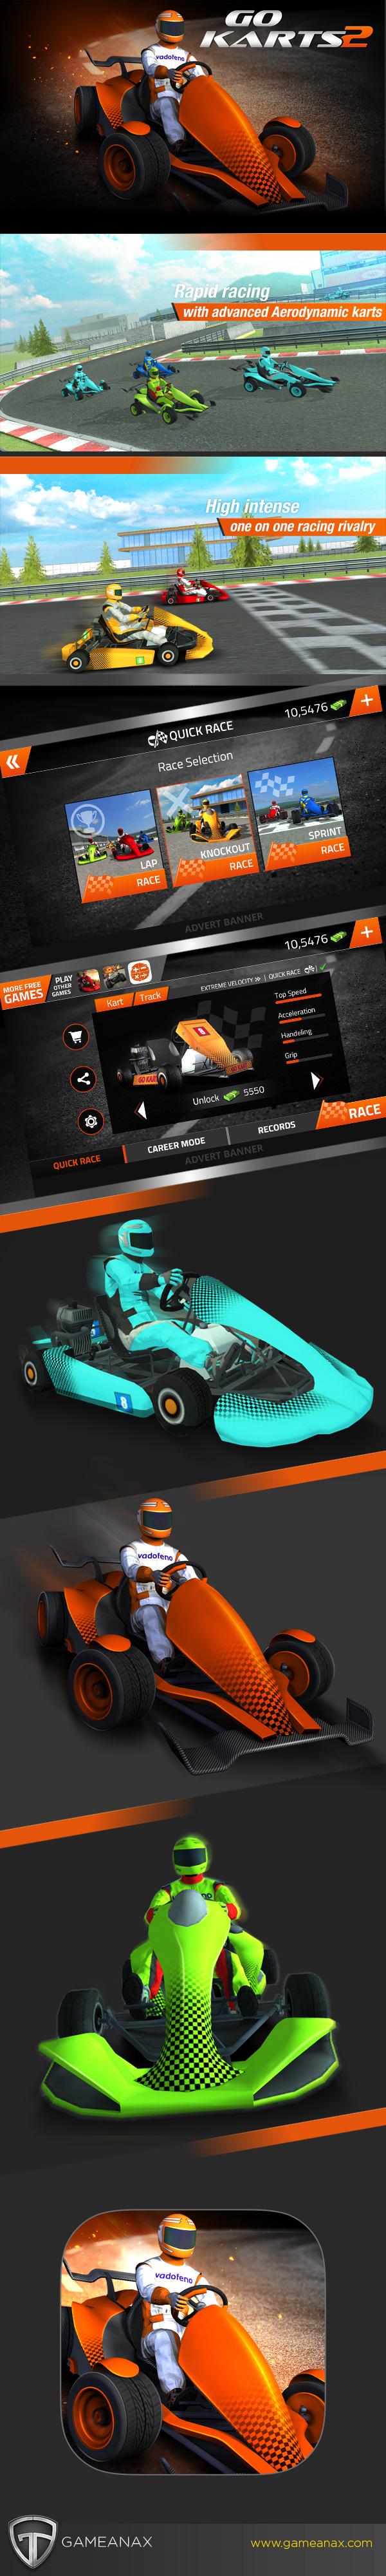 game UI ux mobilegaming ios android Racing race gokarts design